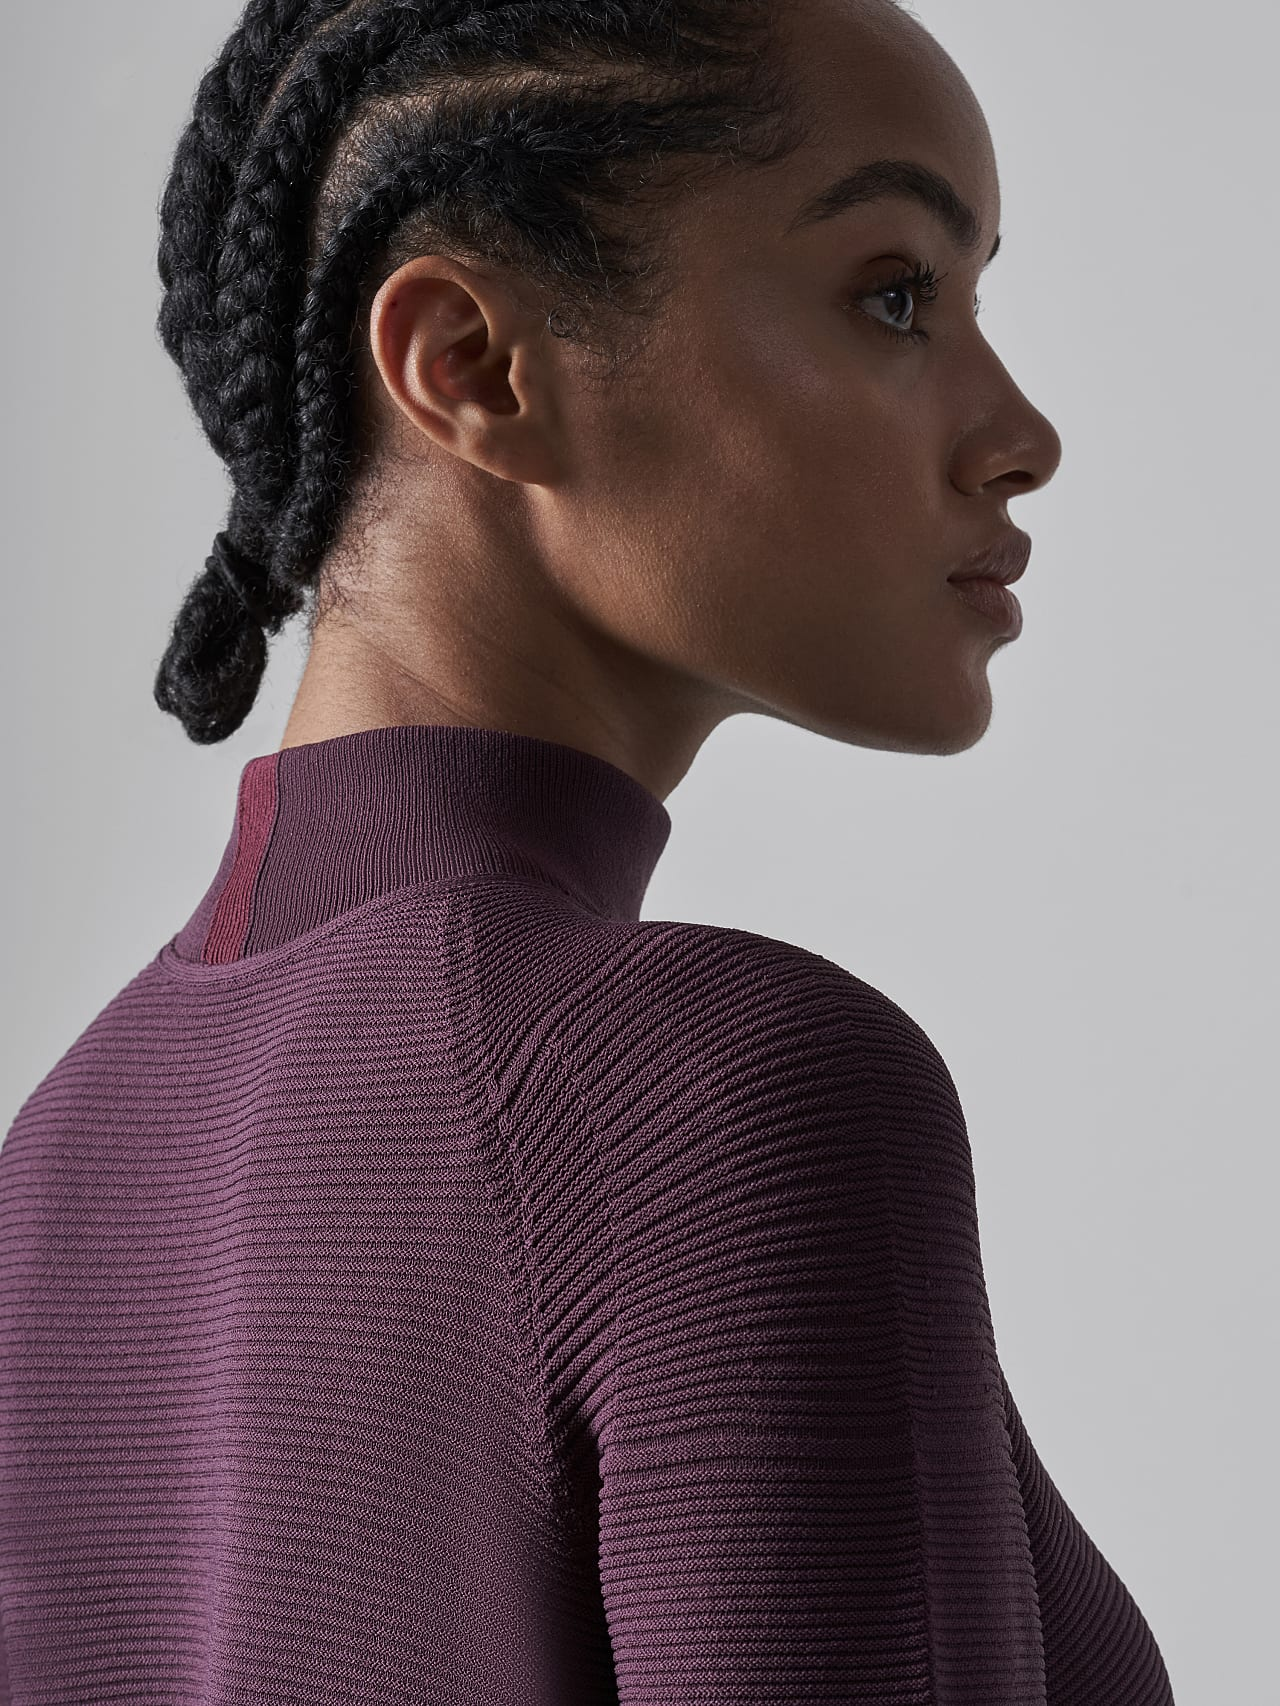 FOXEE V1.Y5.02 Seamless 3D Knit Mock-Neck Dress Burgundy Extra Alpha Tauri